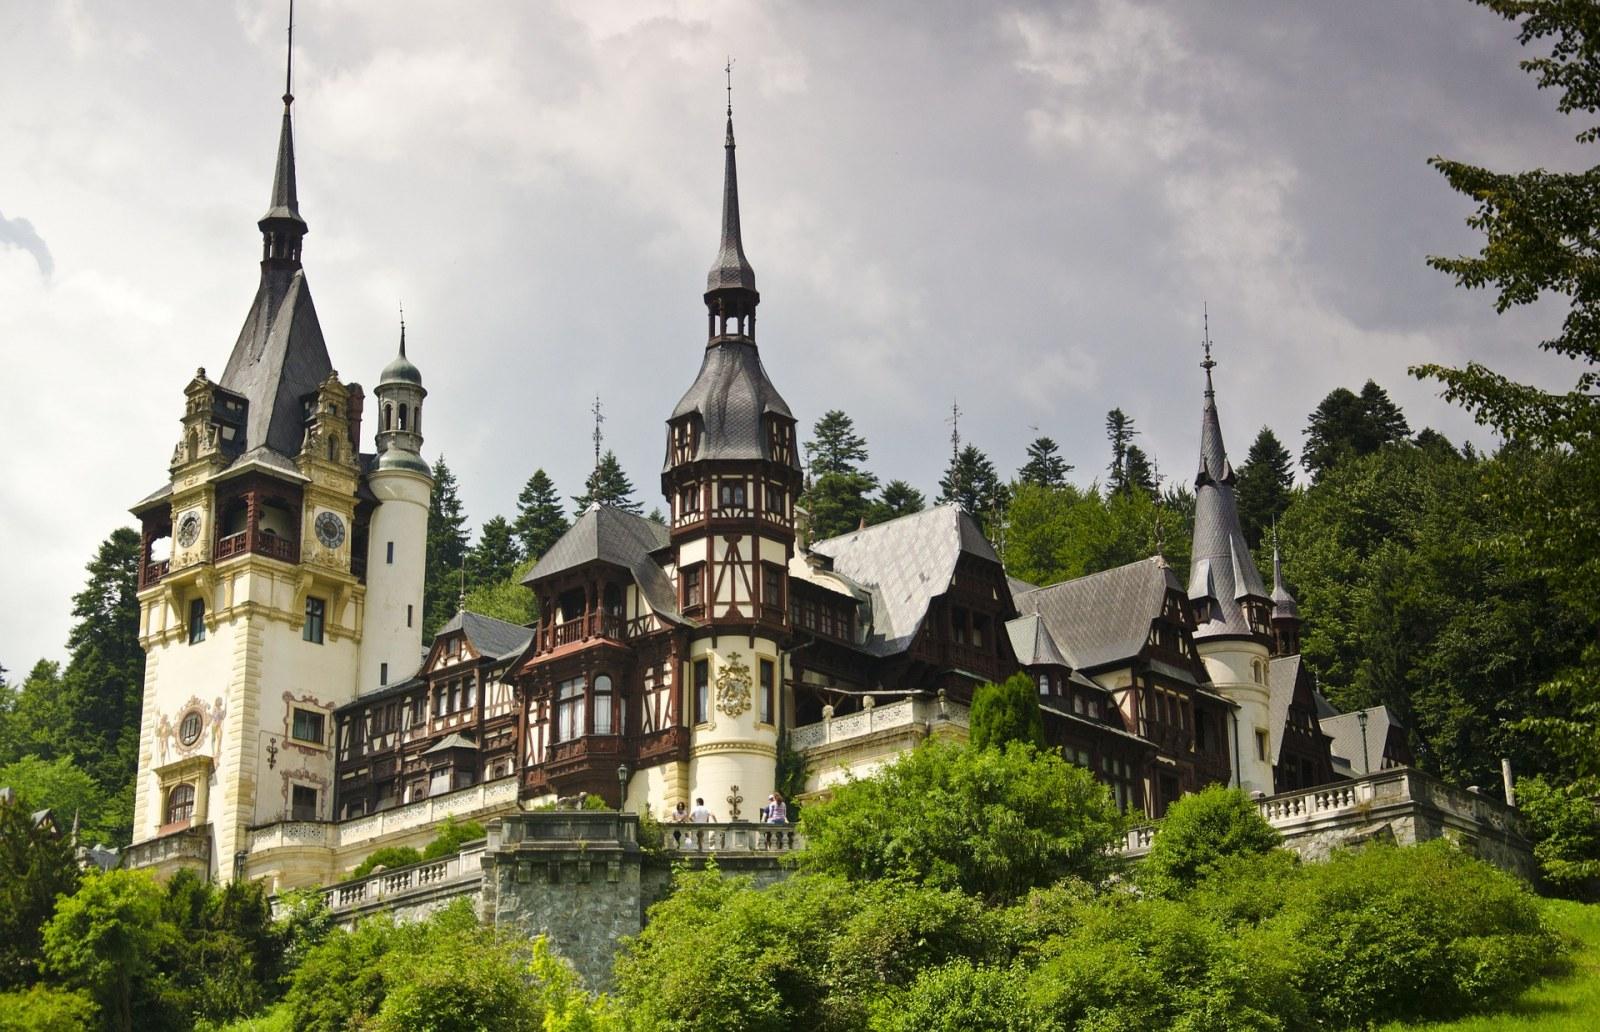 peles-castle, Sinaia, Romanian, Pixabay.com